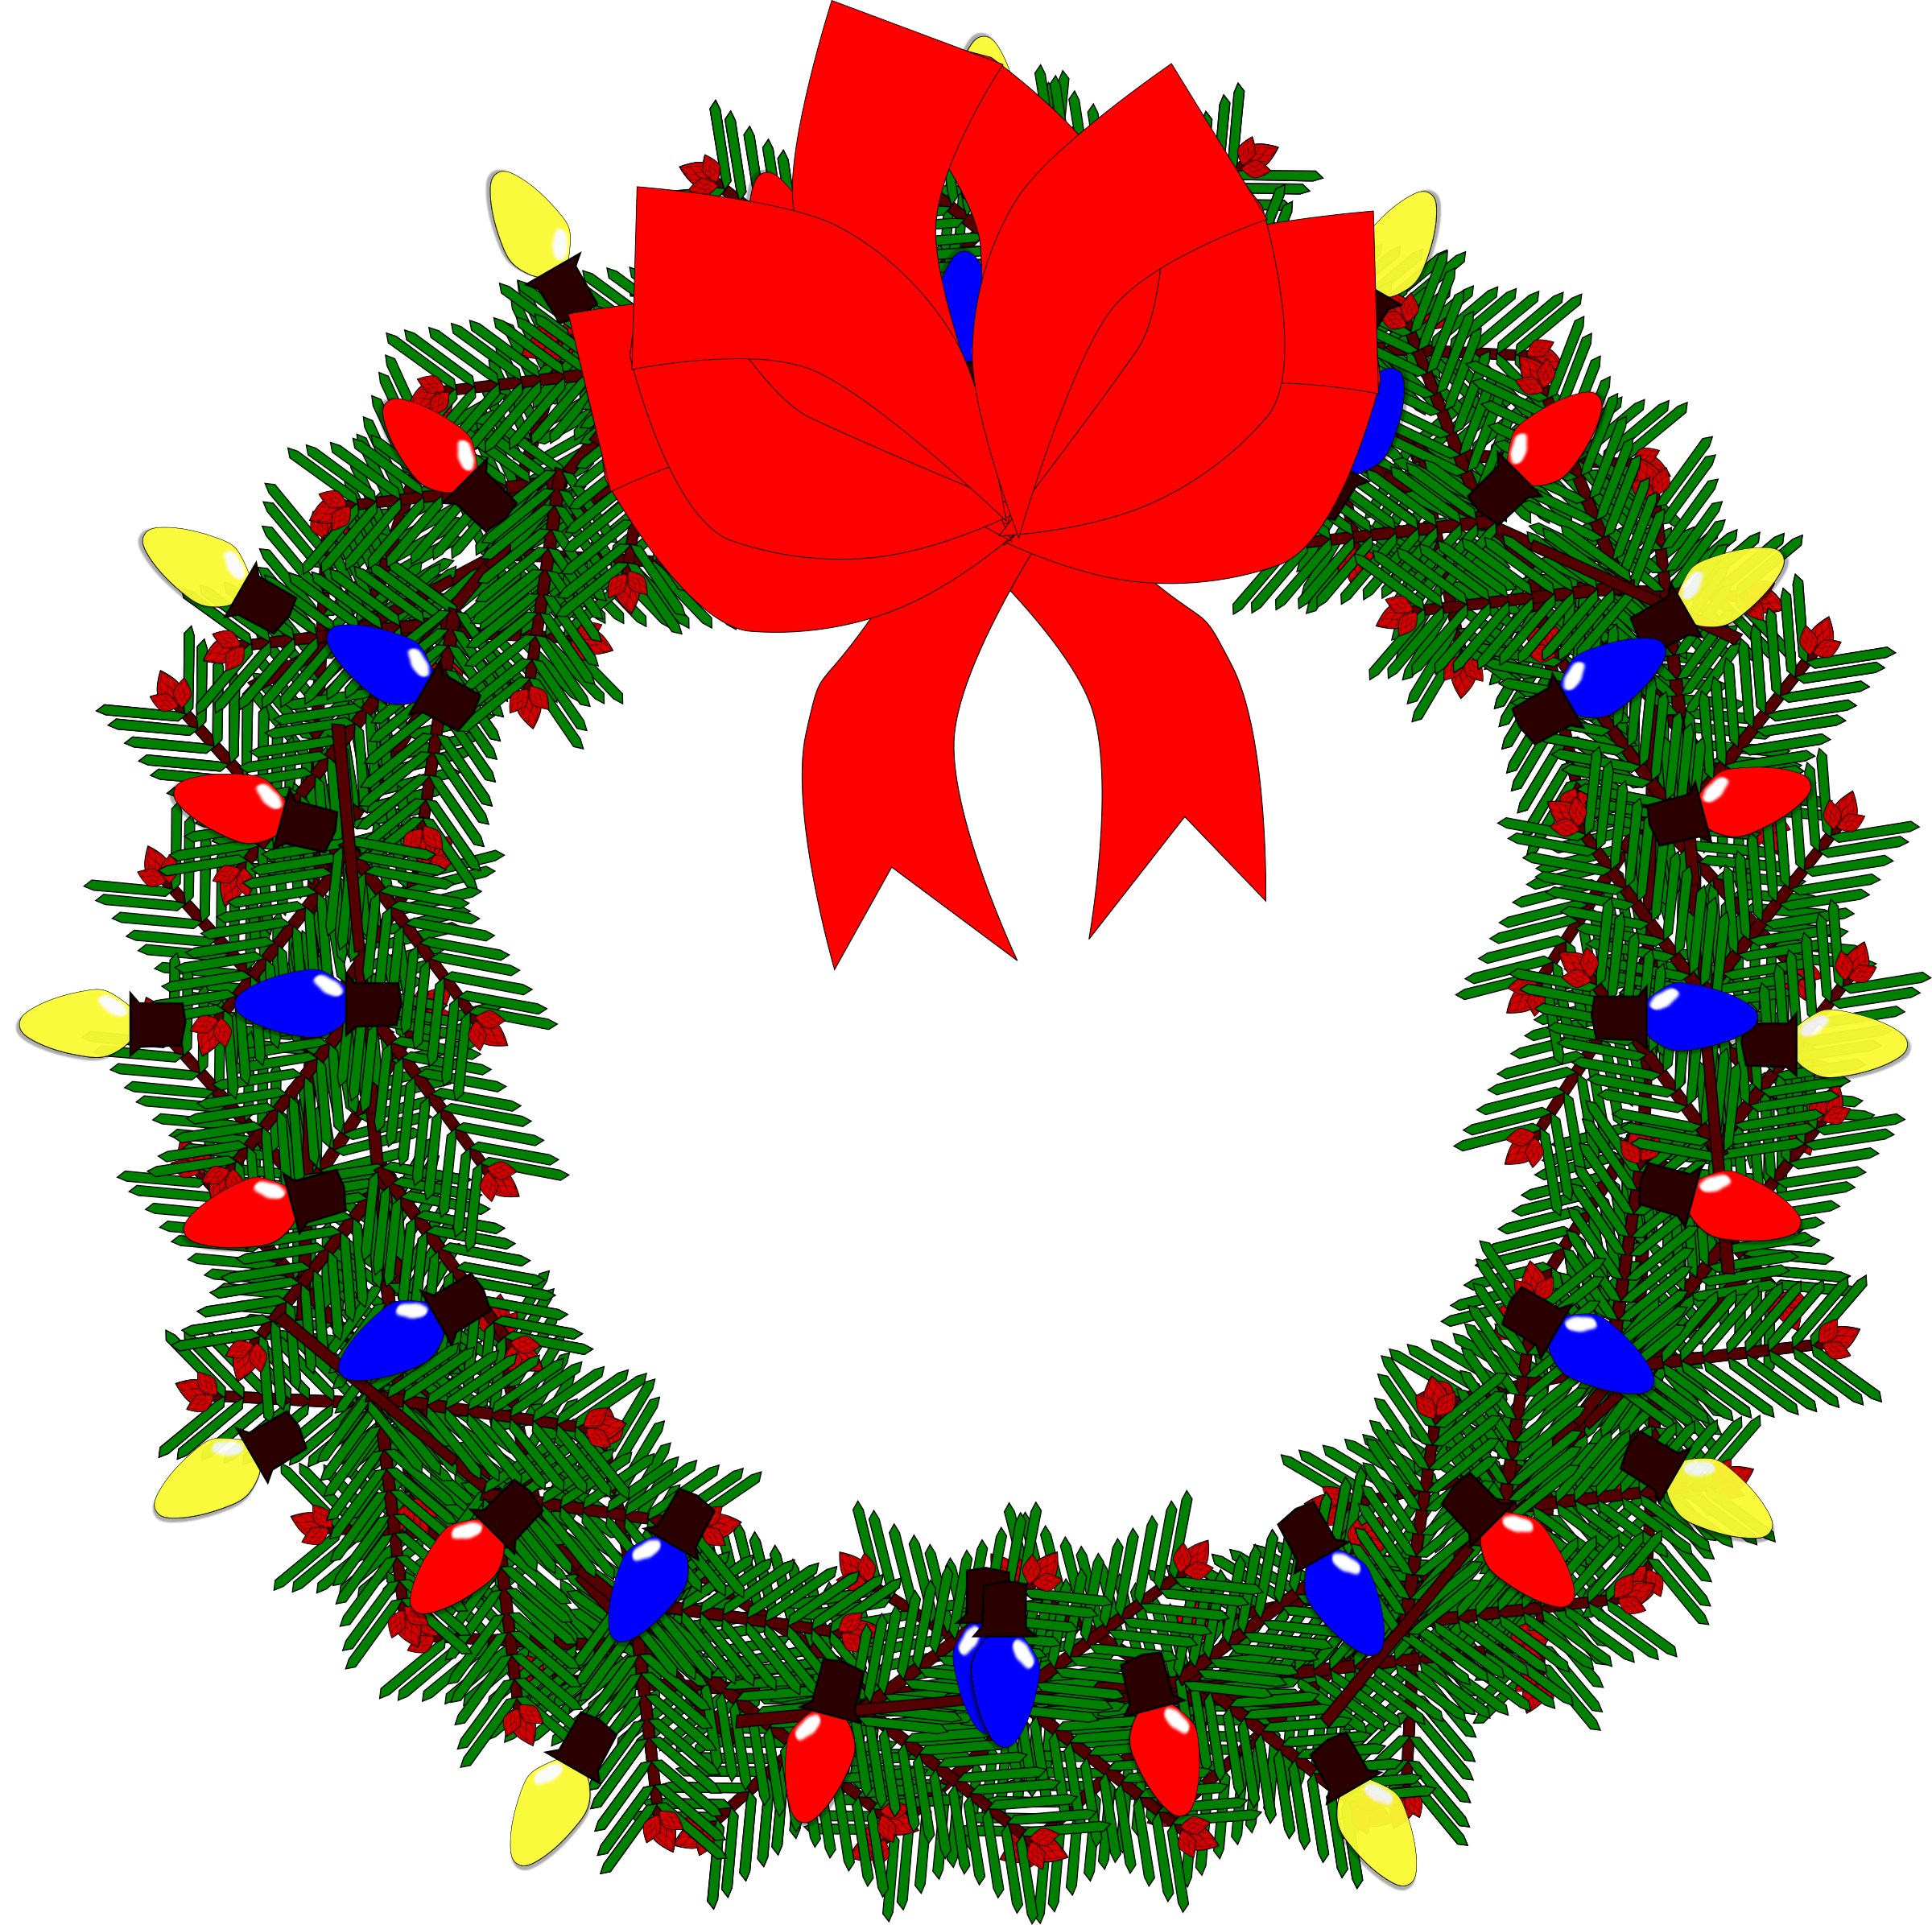 Holiday Wreath Clip Art - ClipArt Best